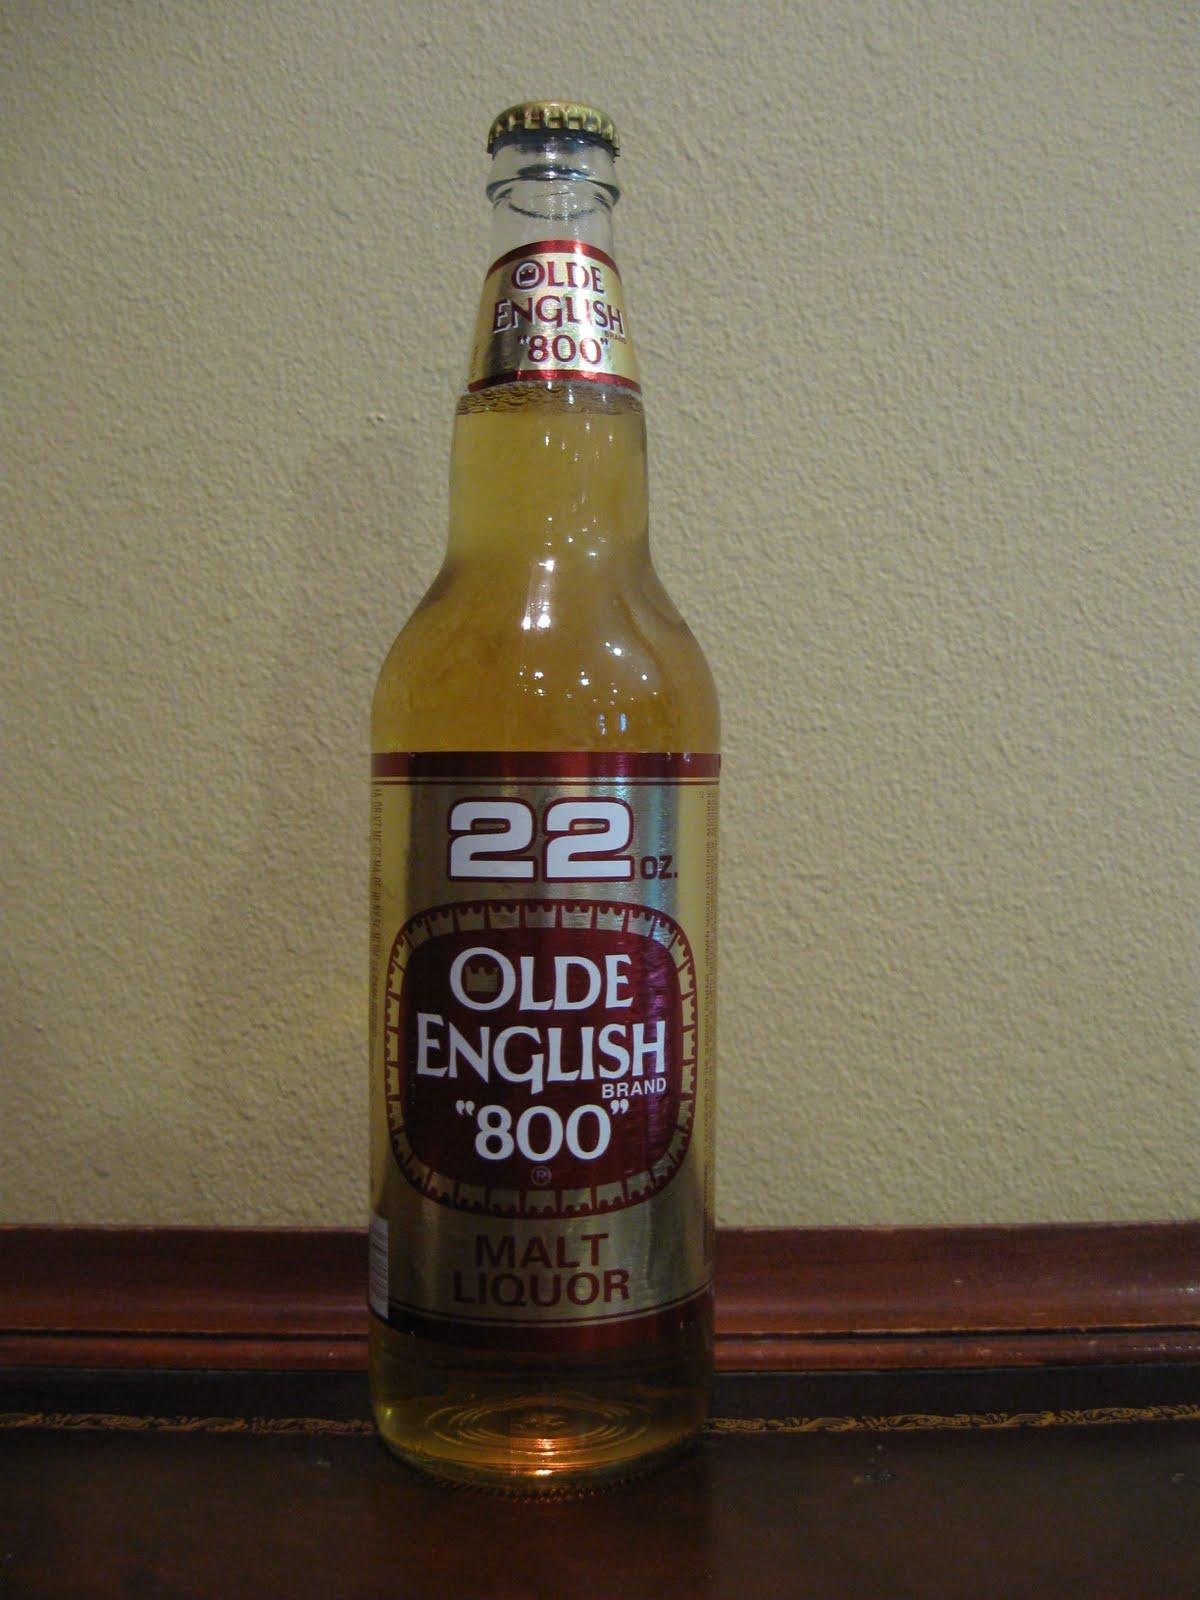 dating old english bottles